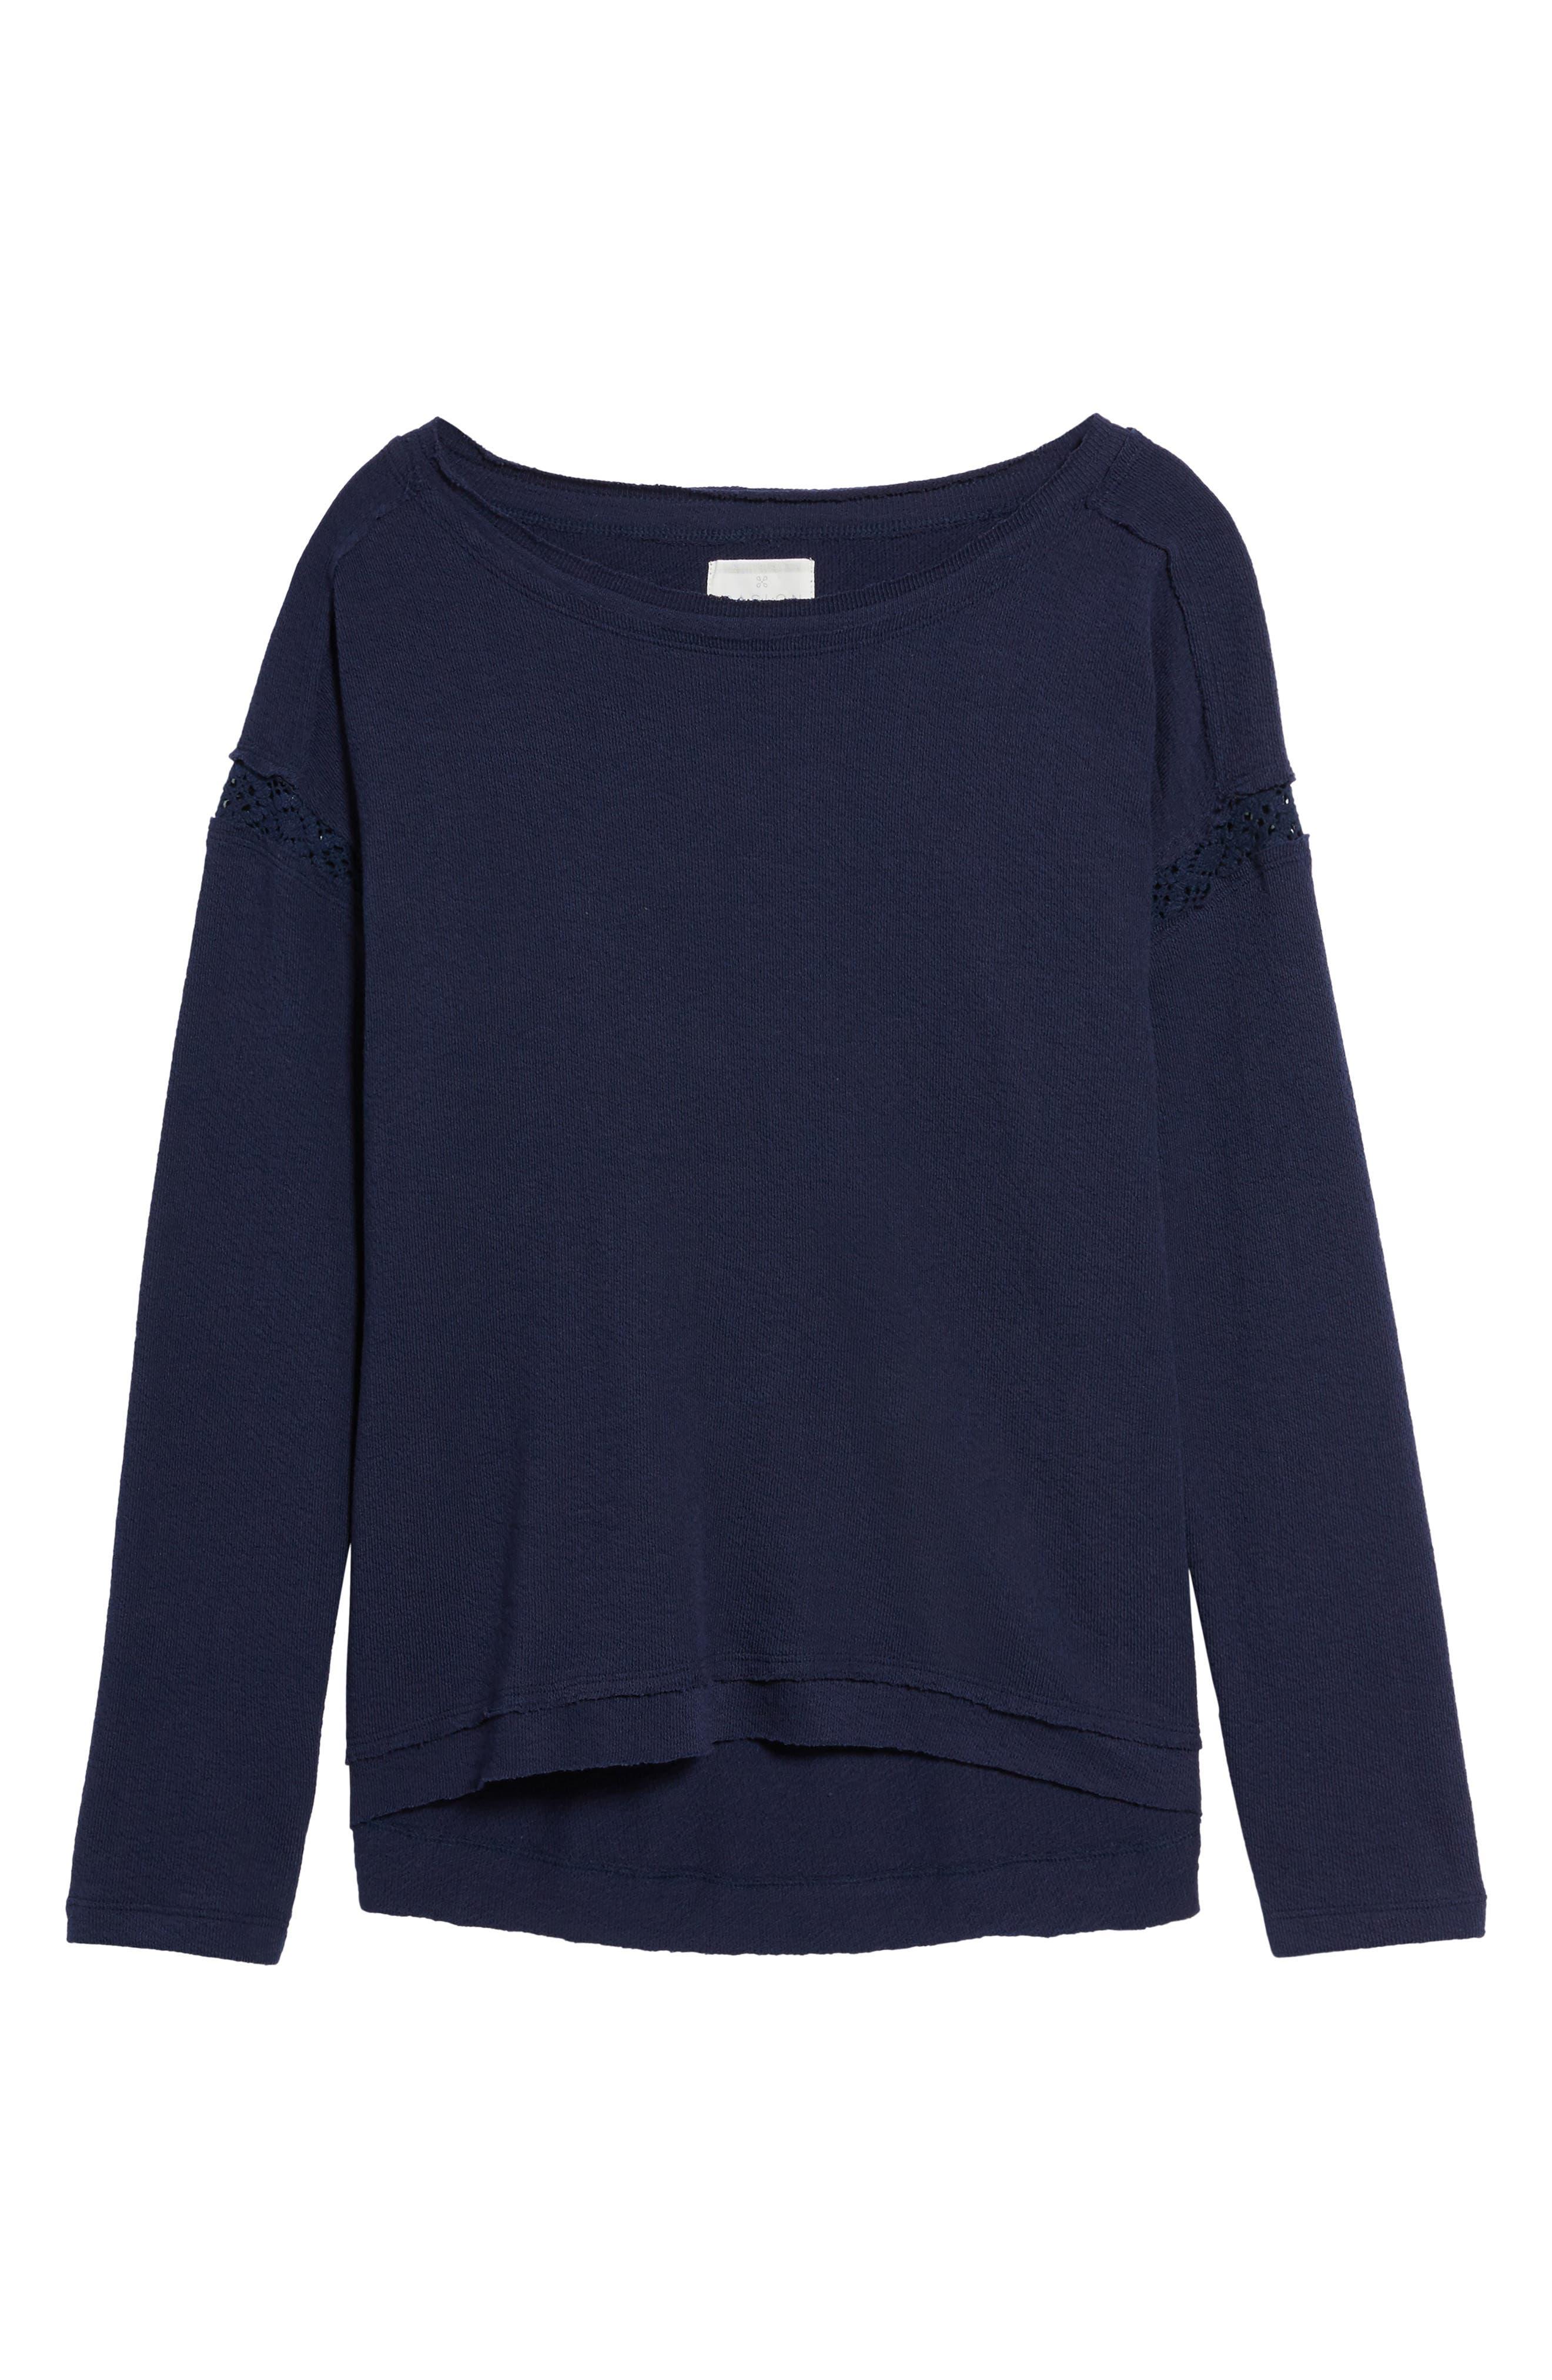 Crochet Lace Trim Sweatshirt,                             Alternate thumbnail 6, color,                             Navy Peacoat